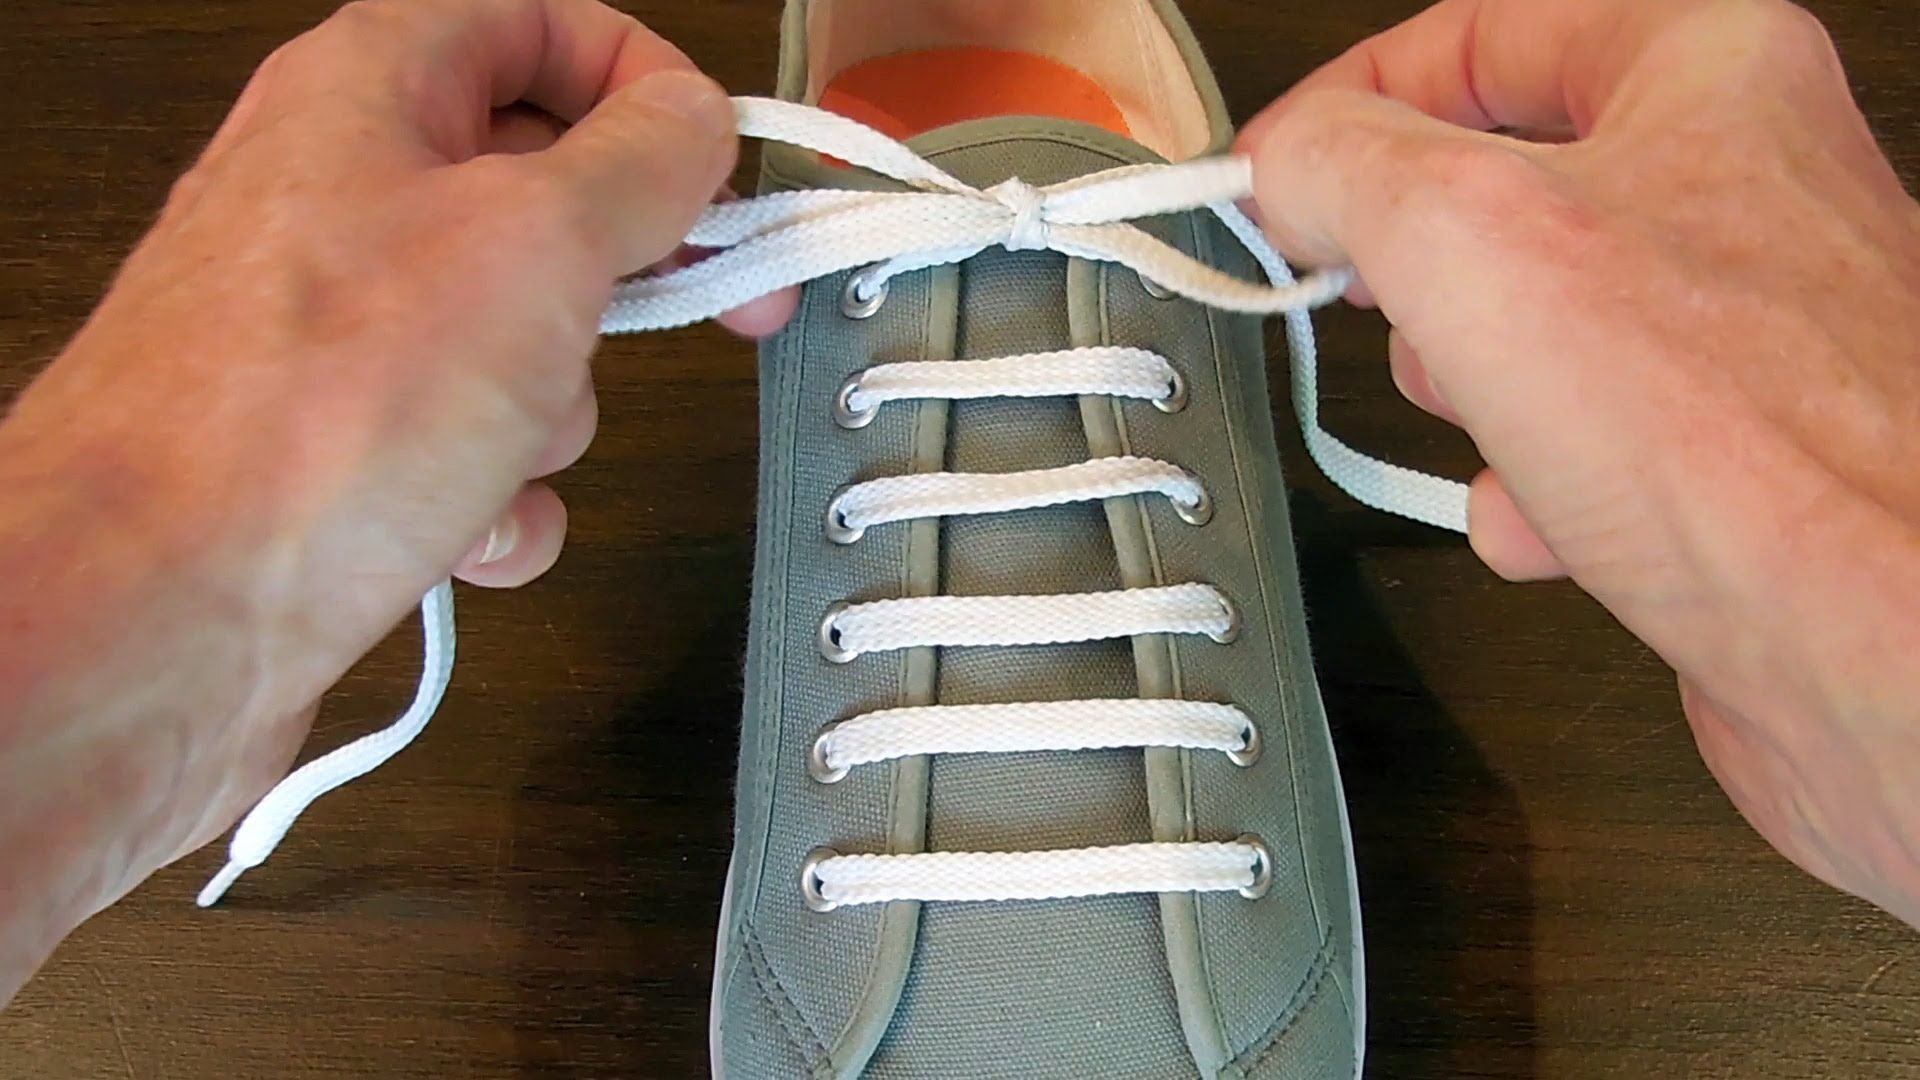 Tying a shoe lace